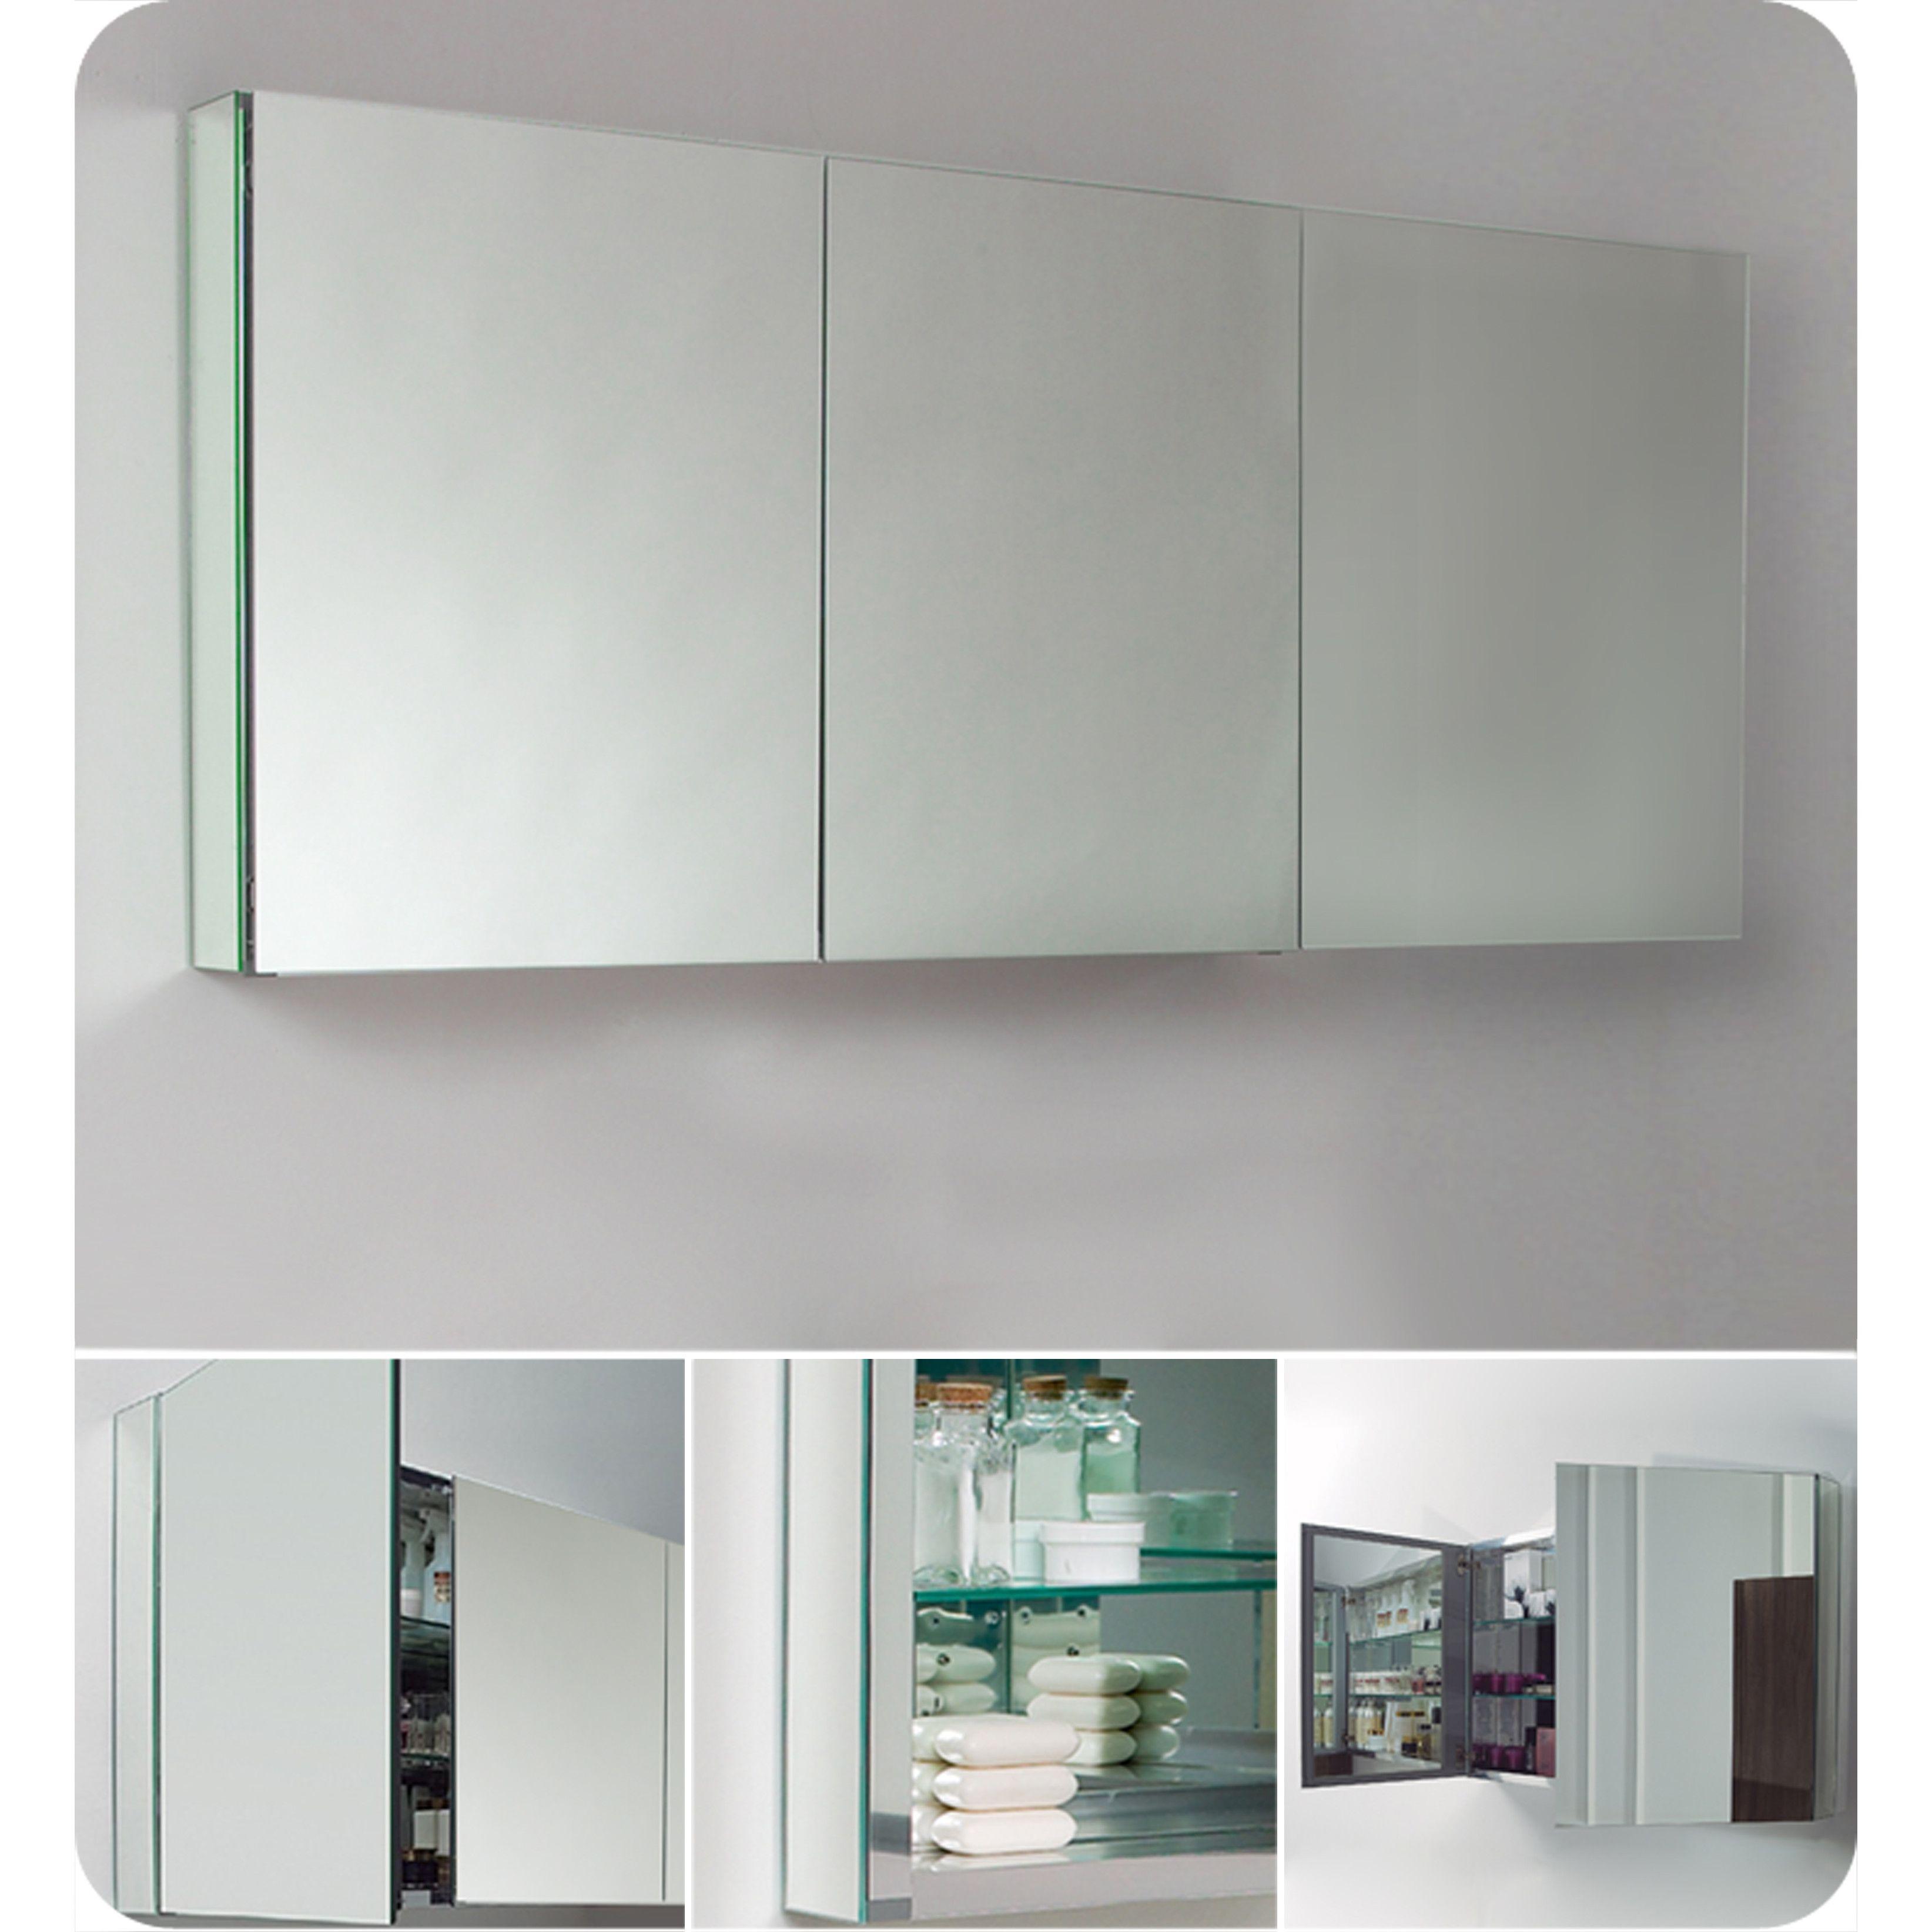 Homebase Kitchen Furniture Cabinet Kitchen Cabinet Handles Homebase Homebase Kitchen Cabinets